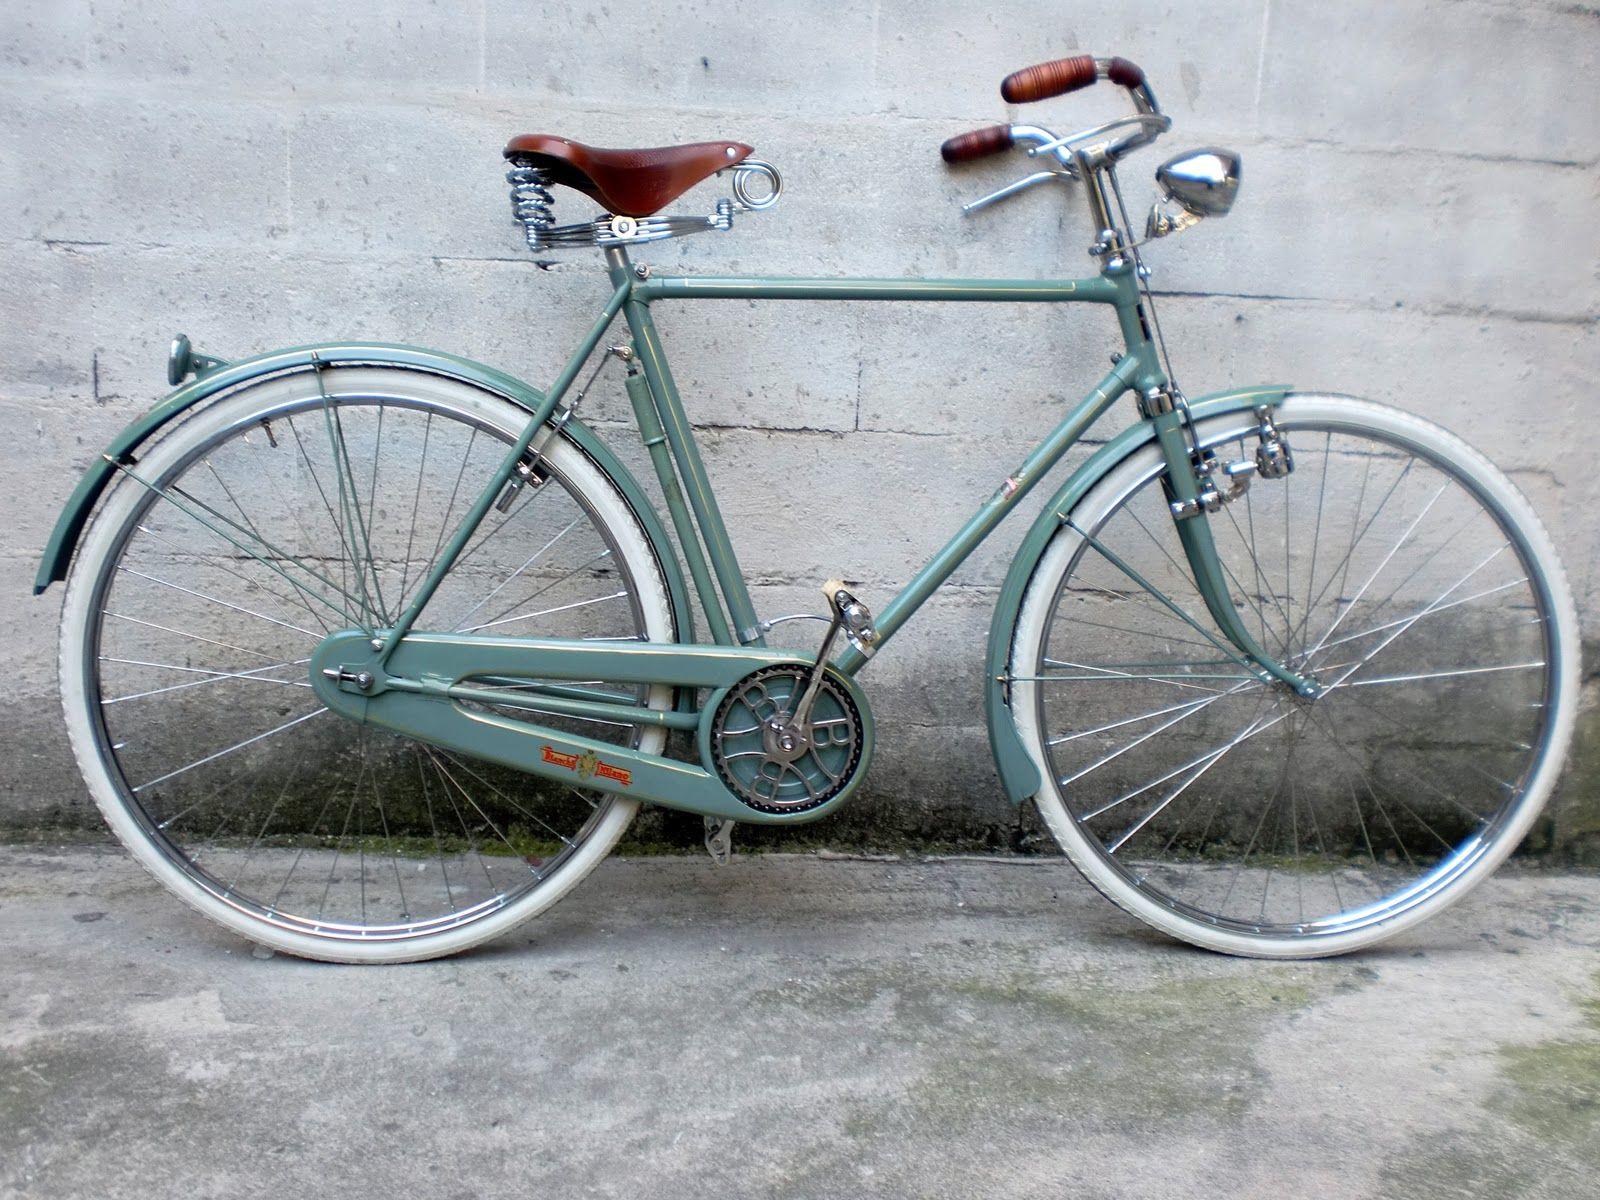 ... cyclocross and mountain bikes. 1952 Bianchi Zaffiro Restoration  60c970034